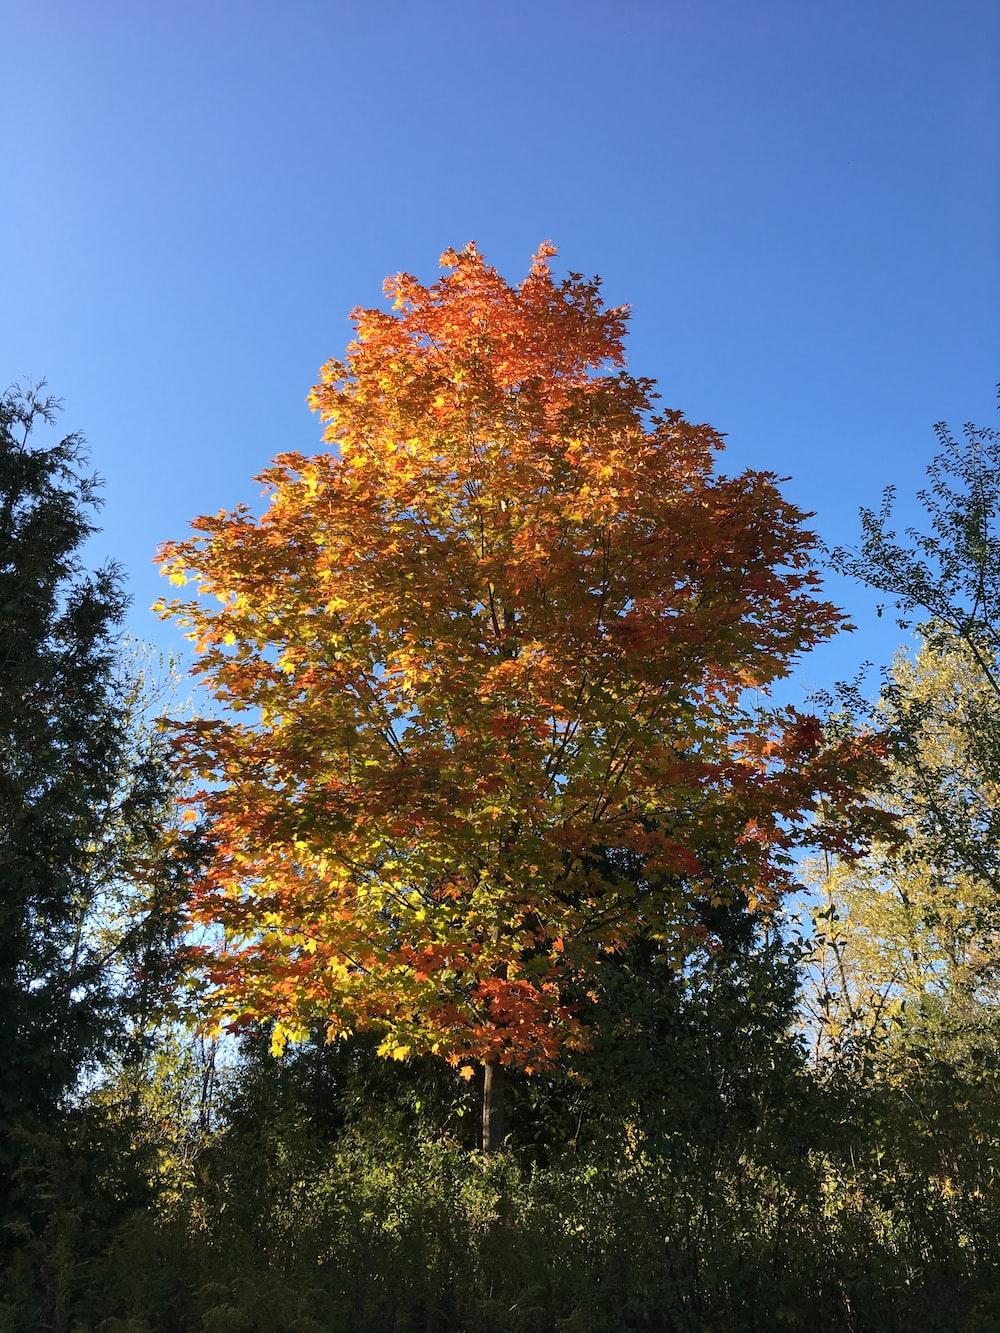 orange and green leaf tree under blue sky during daytime